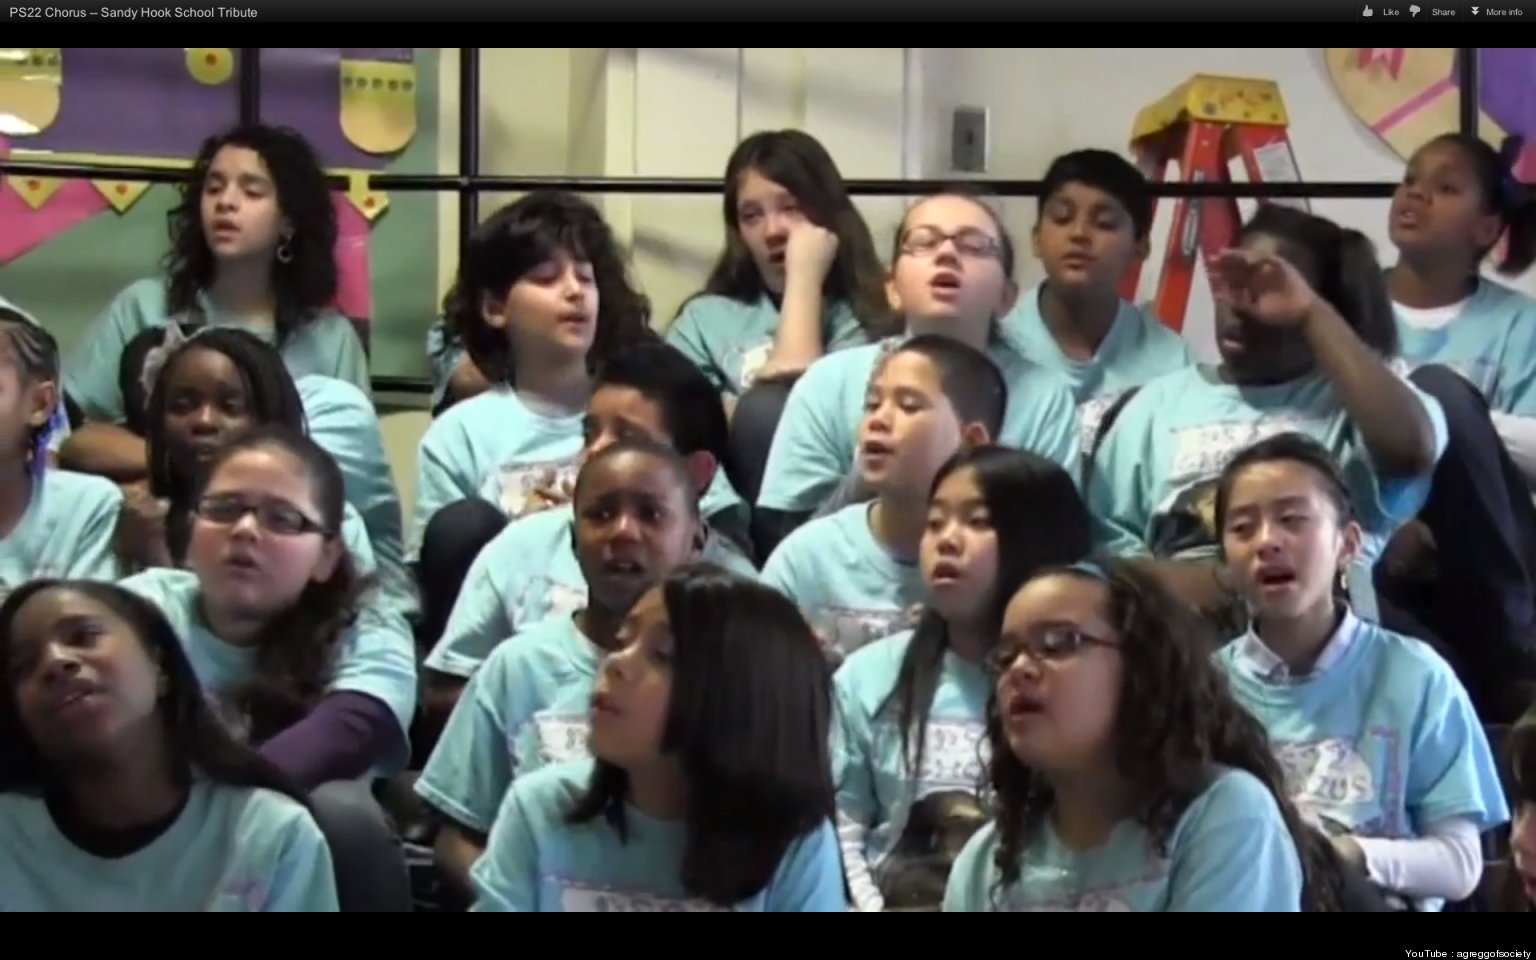 Celebrity Tributes To Sandy Hook Elementary School | Vibe